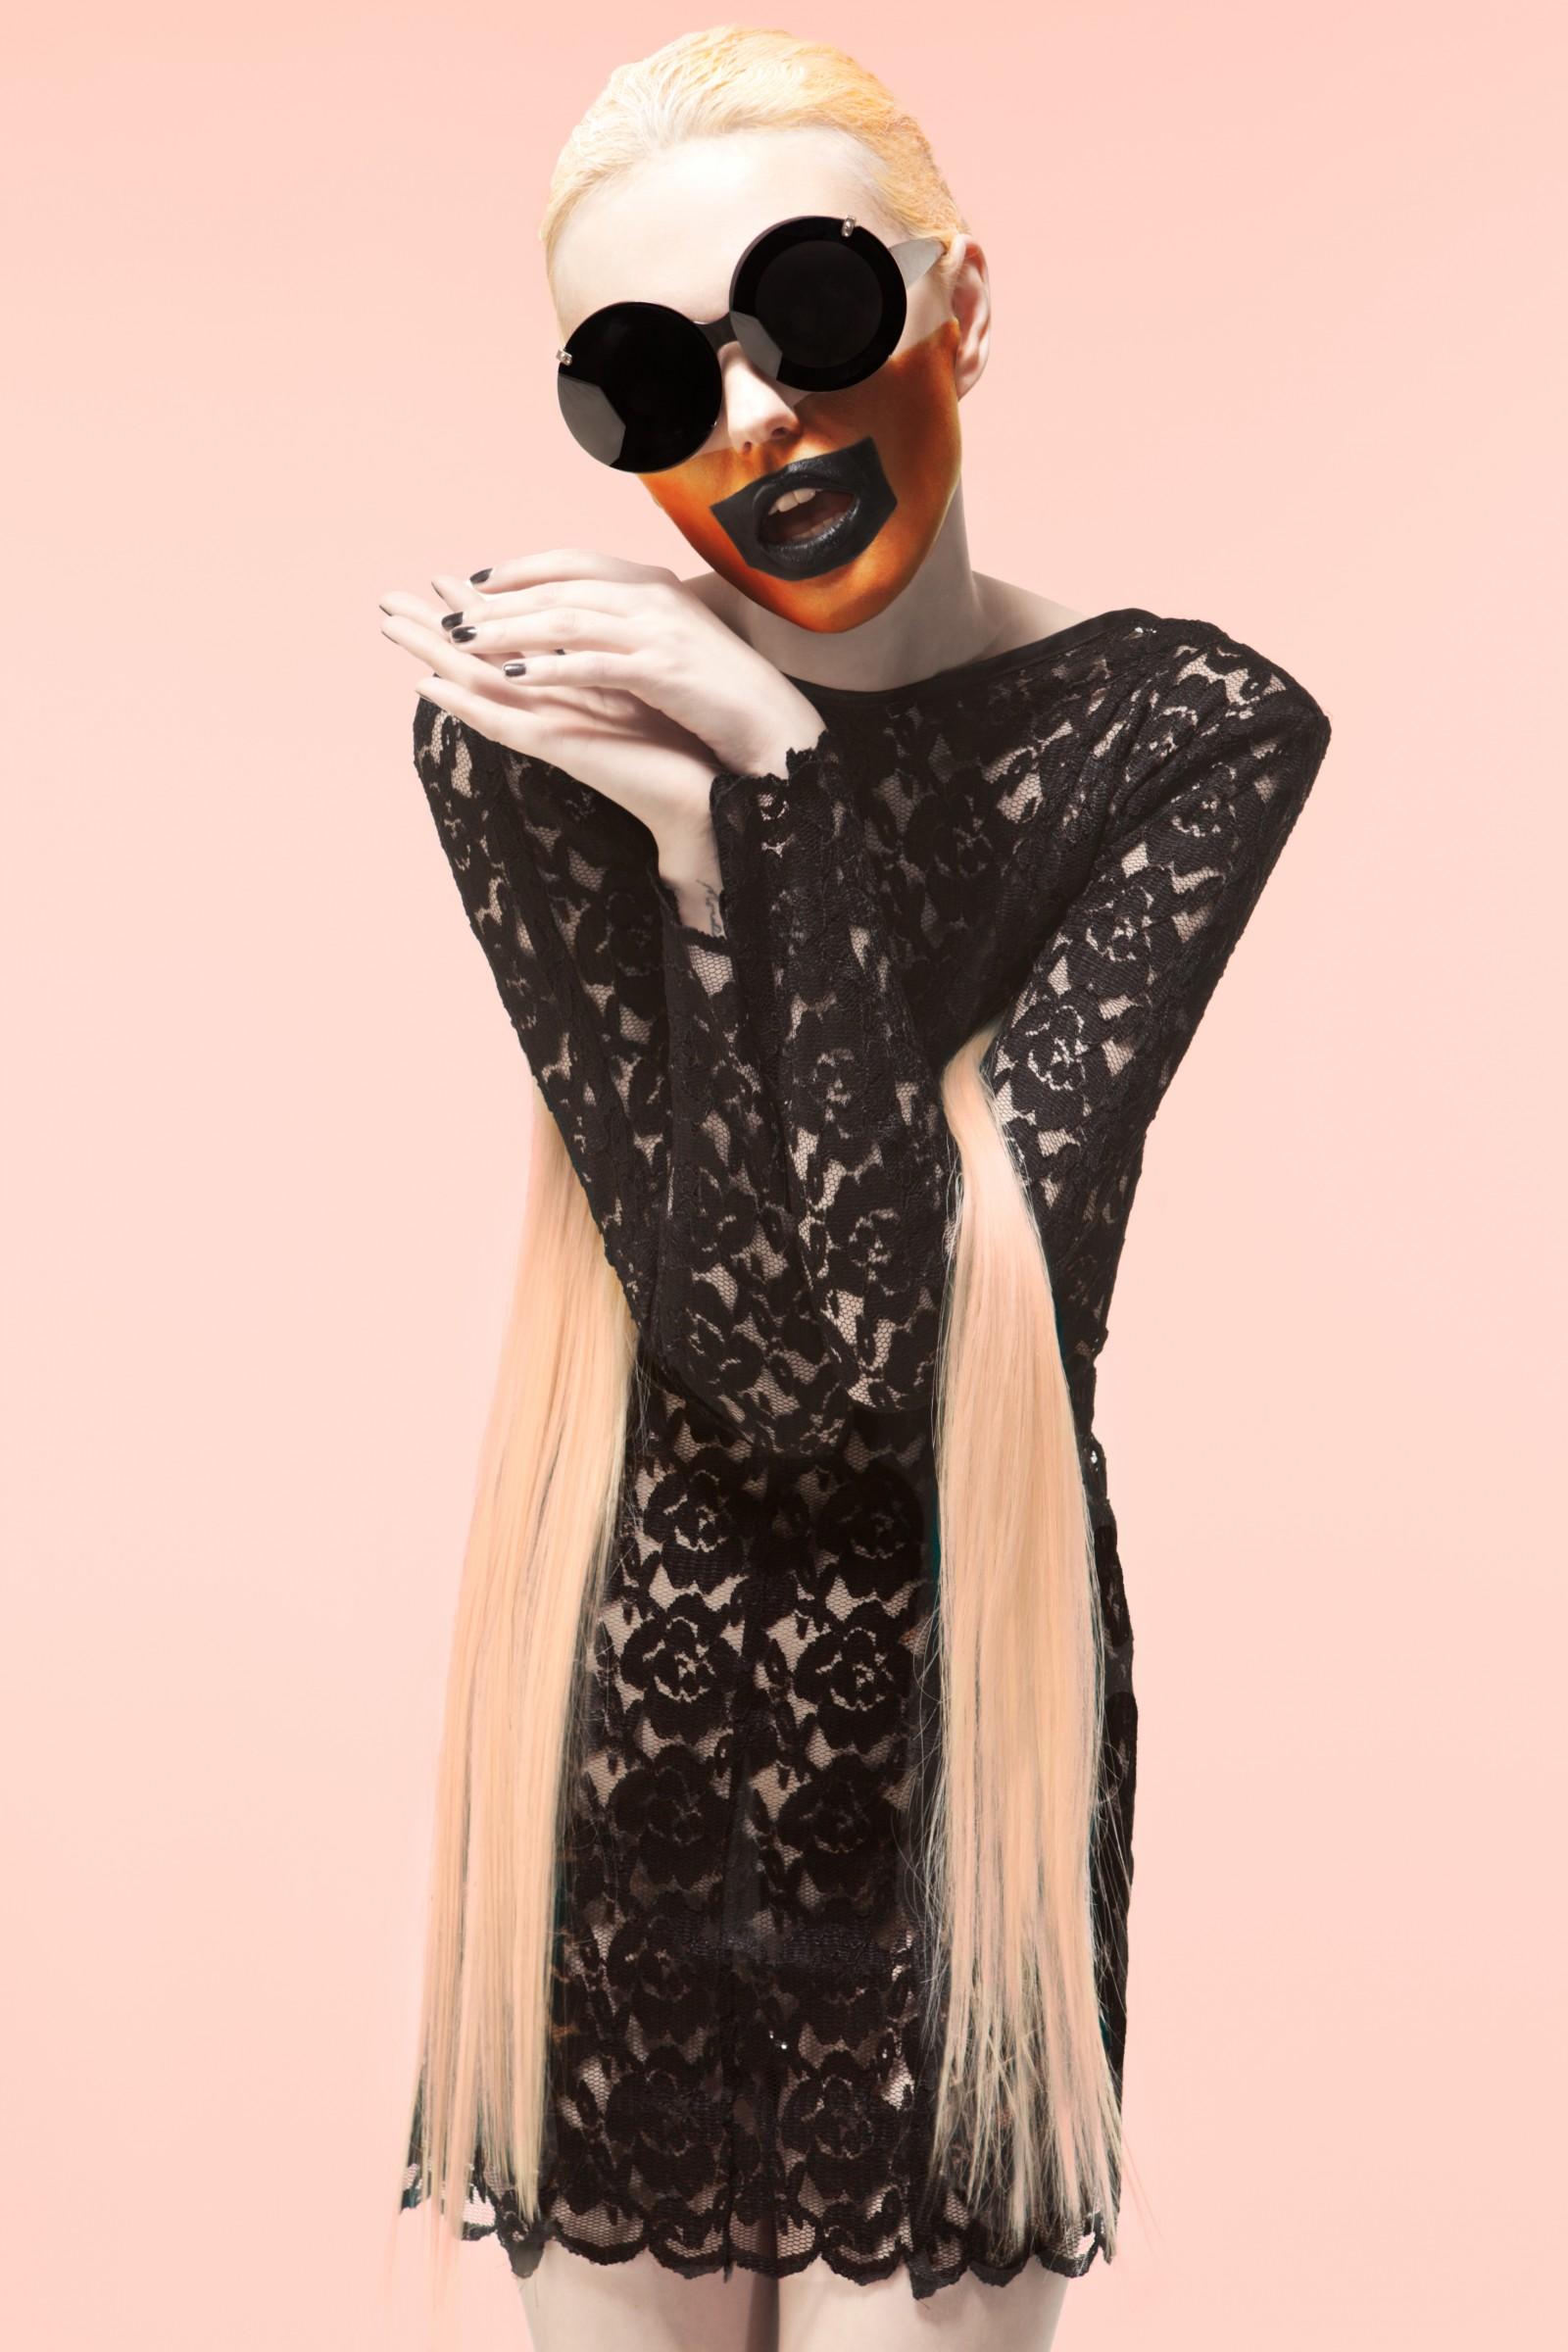 Bonnie Strange for Marina Ballerina PSD-7 2